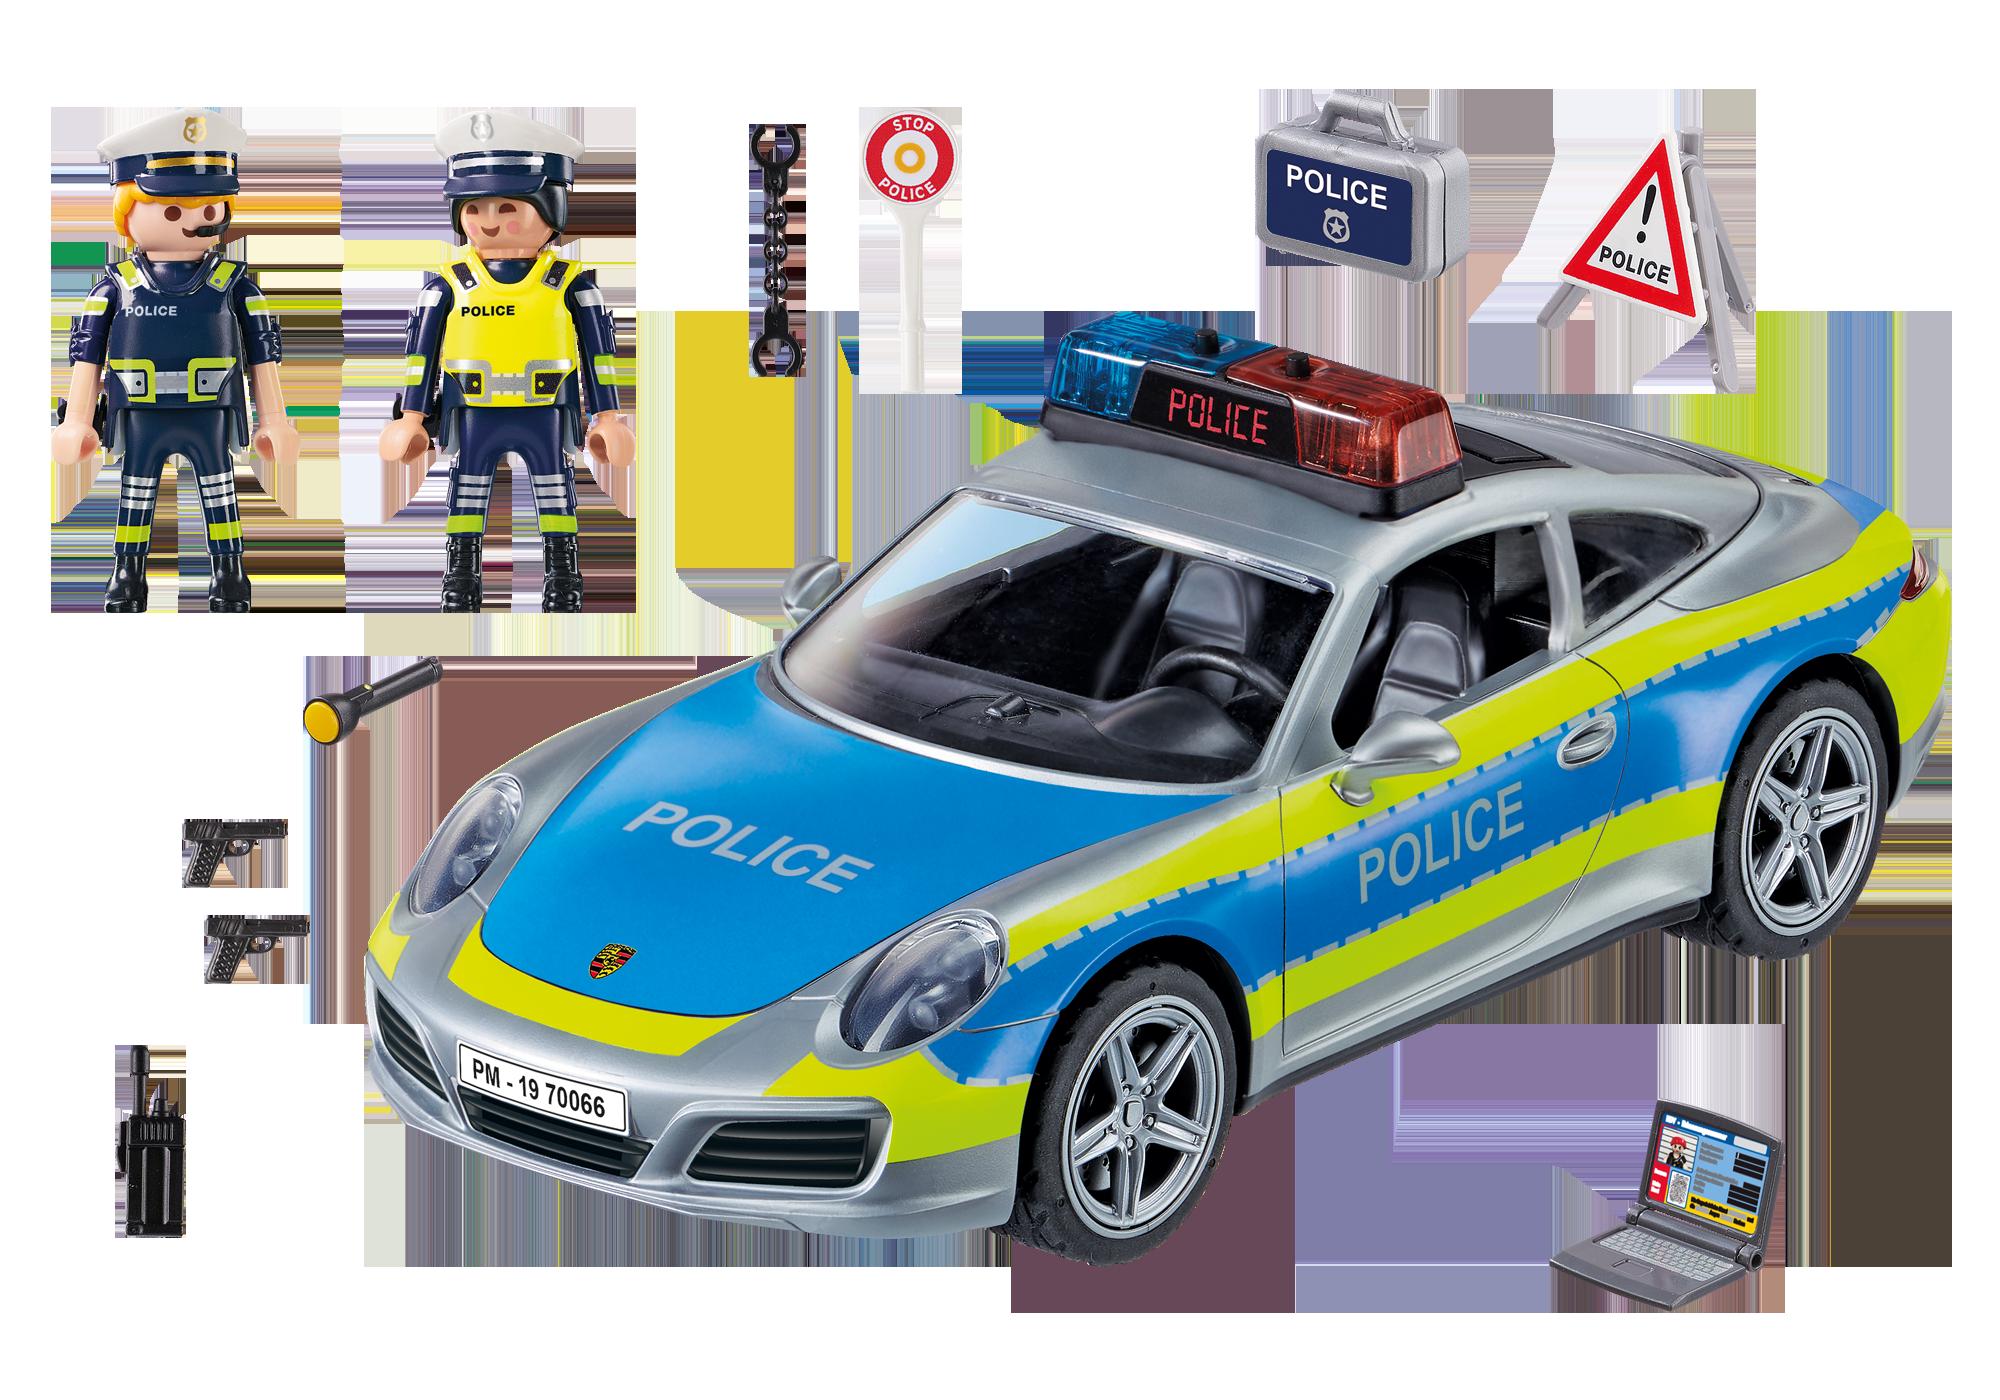 http://media.playmobil.com/i/playmobil/70066_product_box_back/Porsche 911 Carrera 4S Police